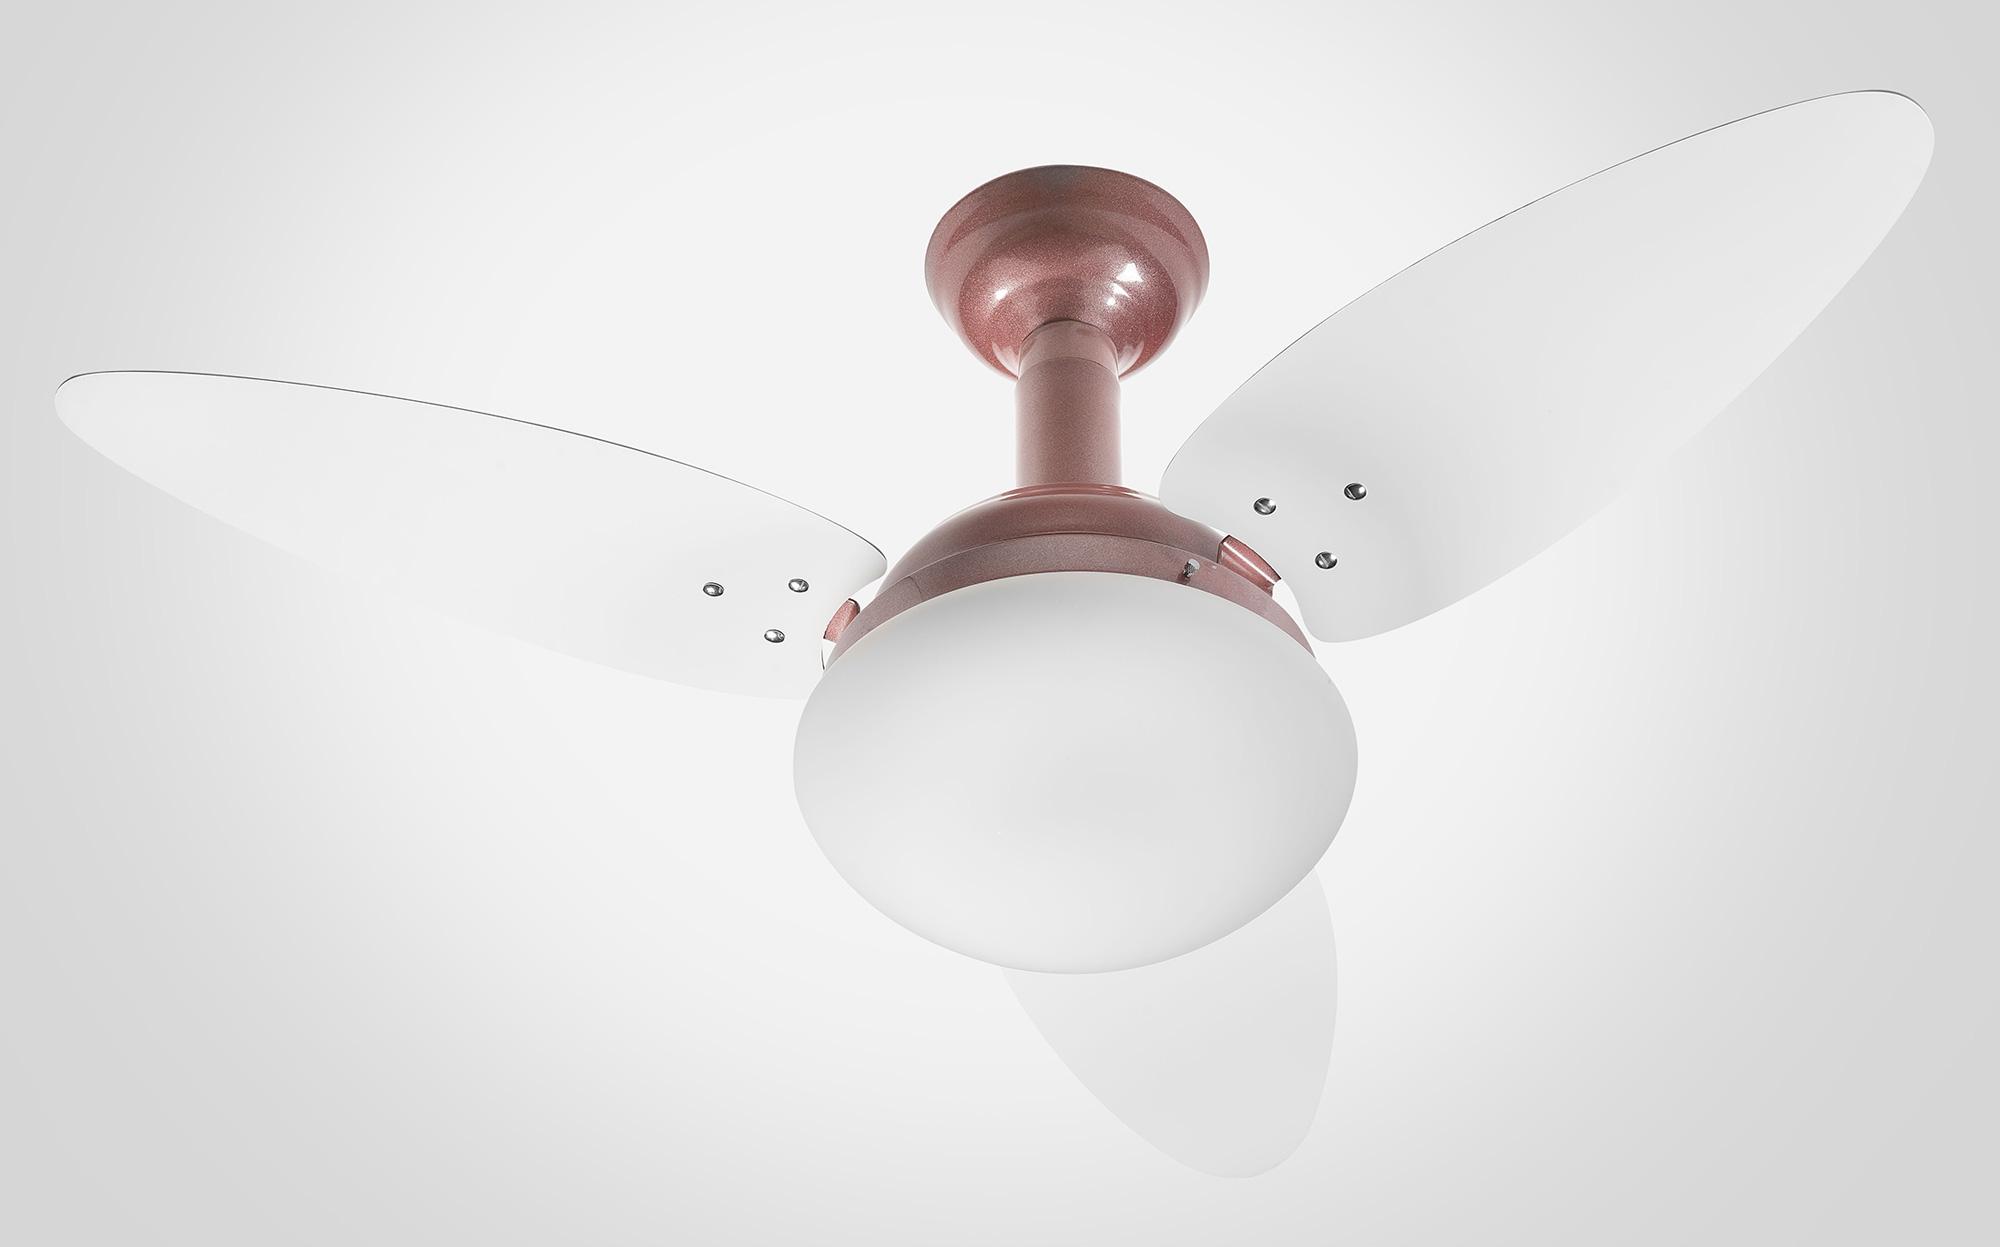 Ventilador de Teto Jet Venti-delta Rosê 3Pás Brancas 220 V